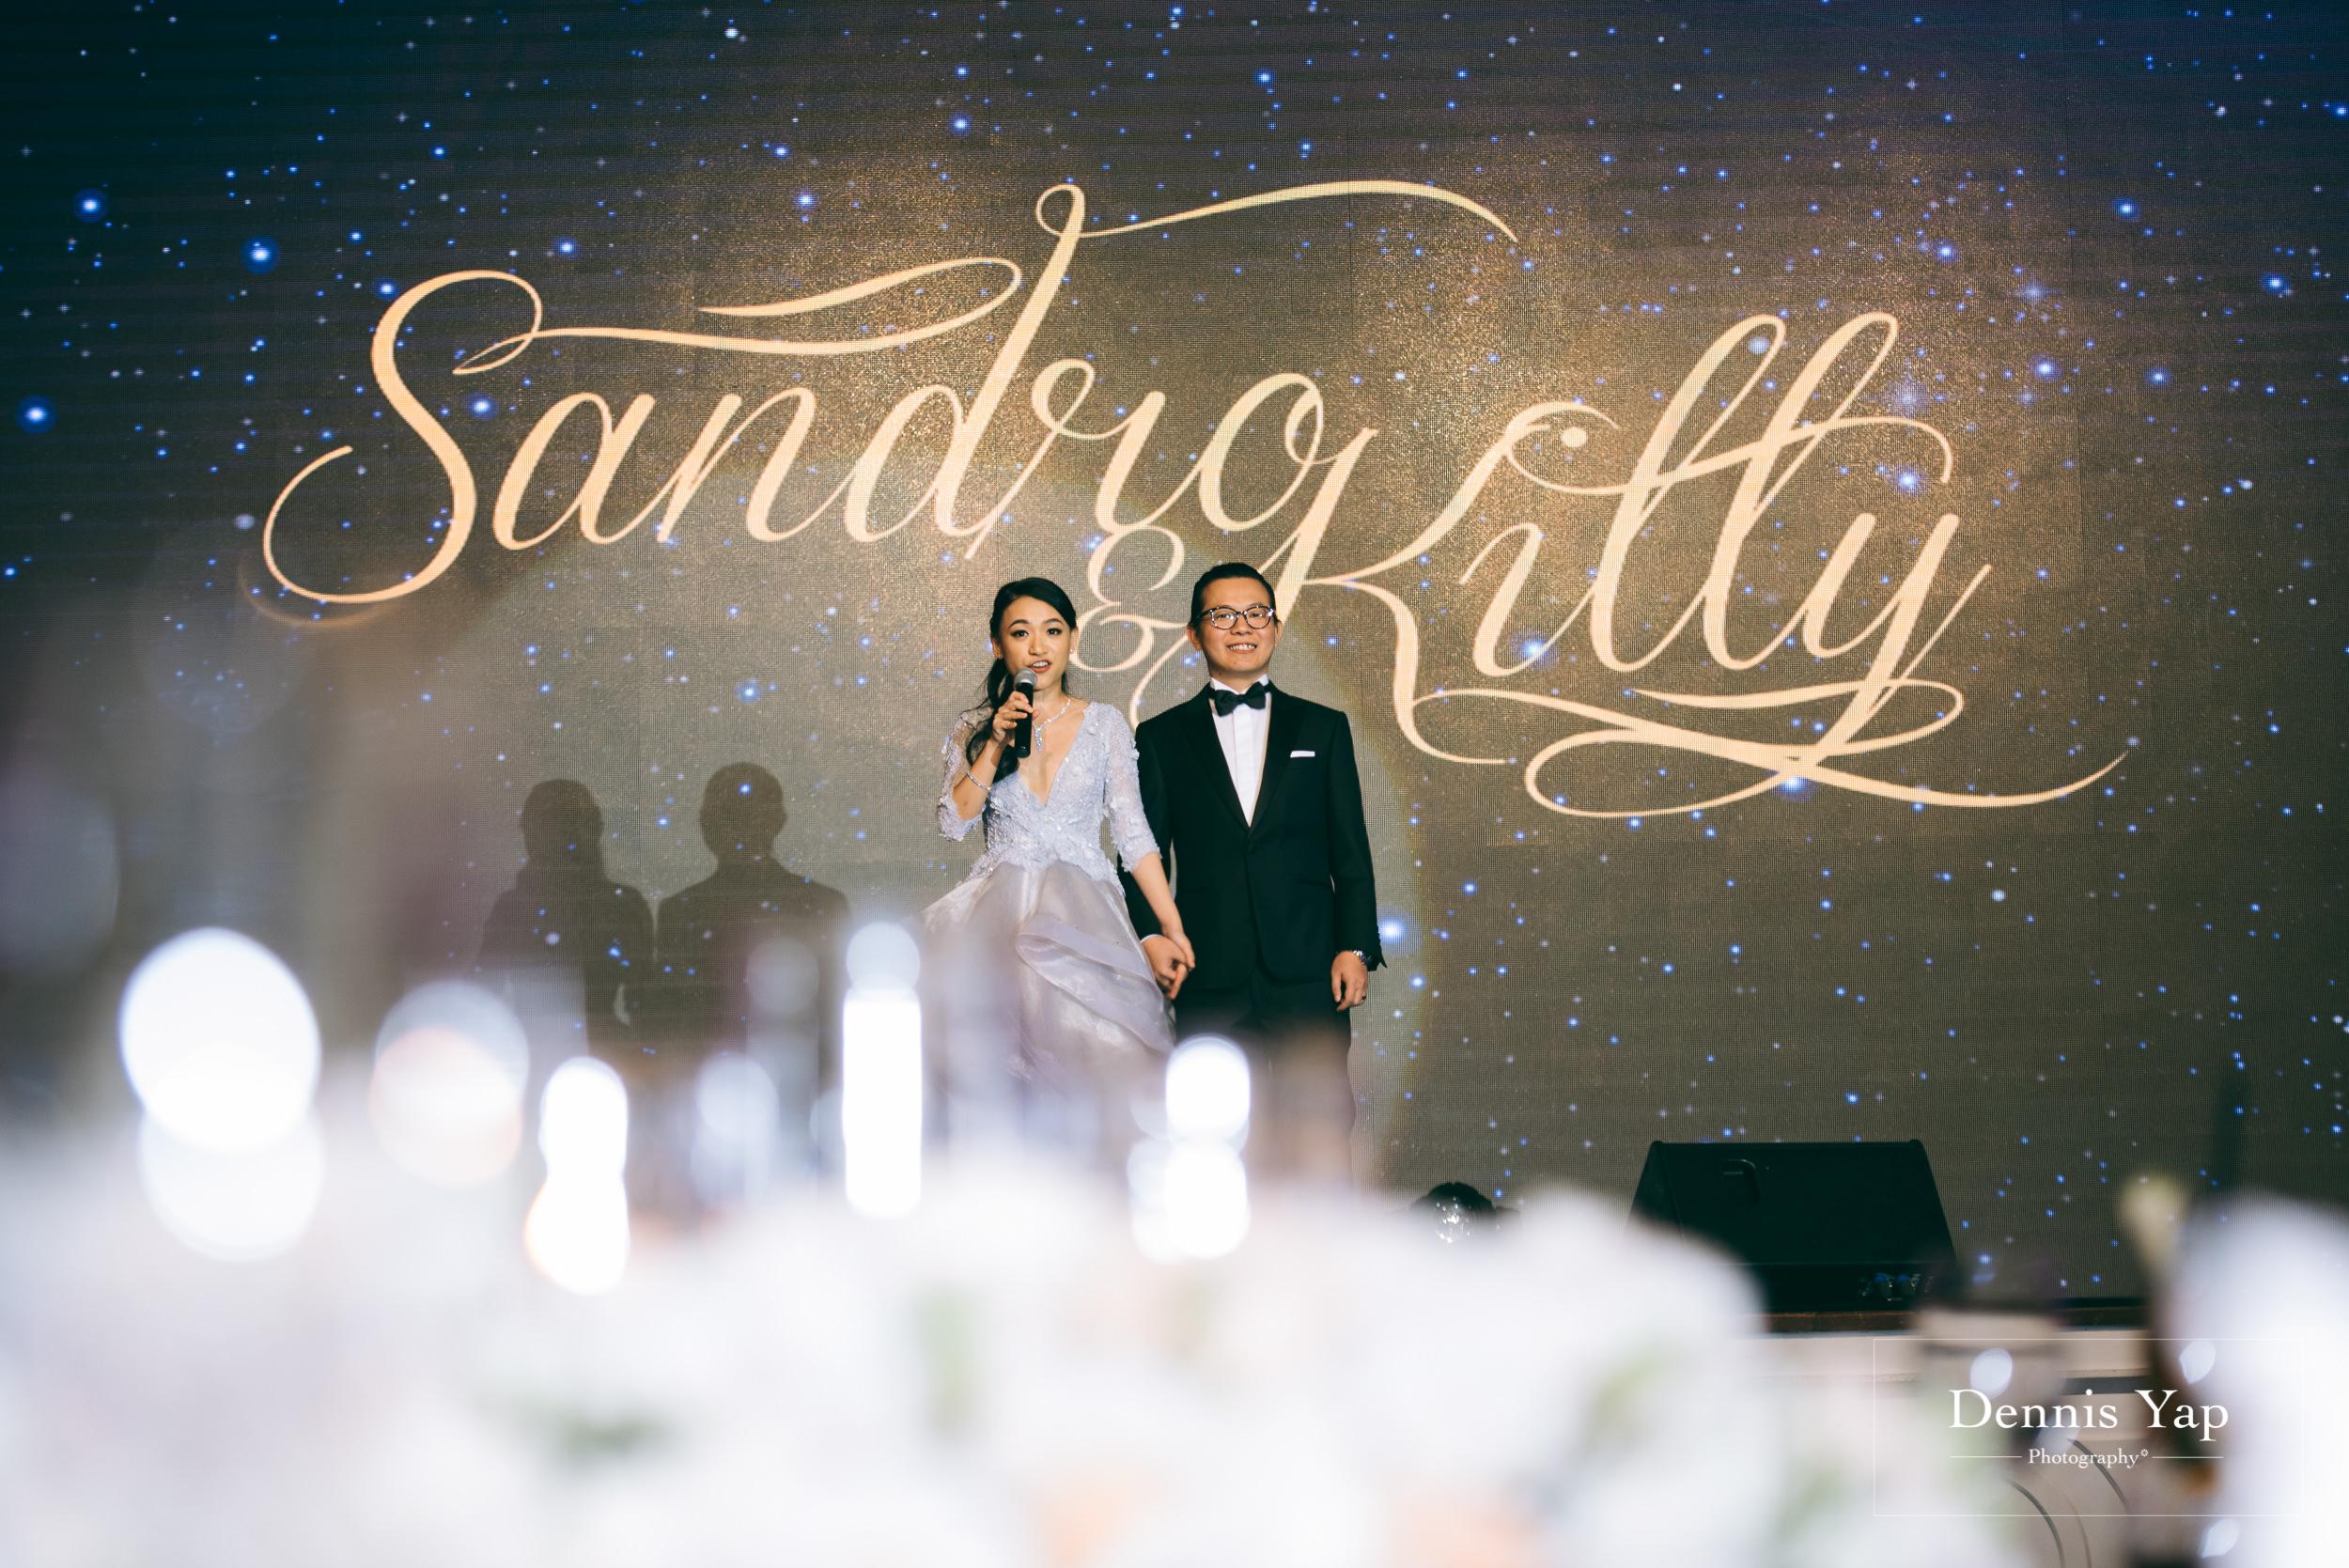 sandro kitty wedding day majestic hotel kuala lumpur dennis yap photography malaysia top wedding photographer-46.jpg